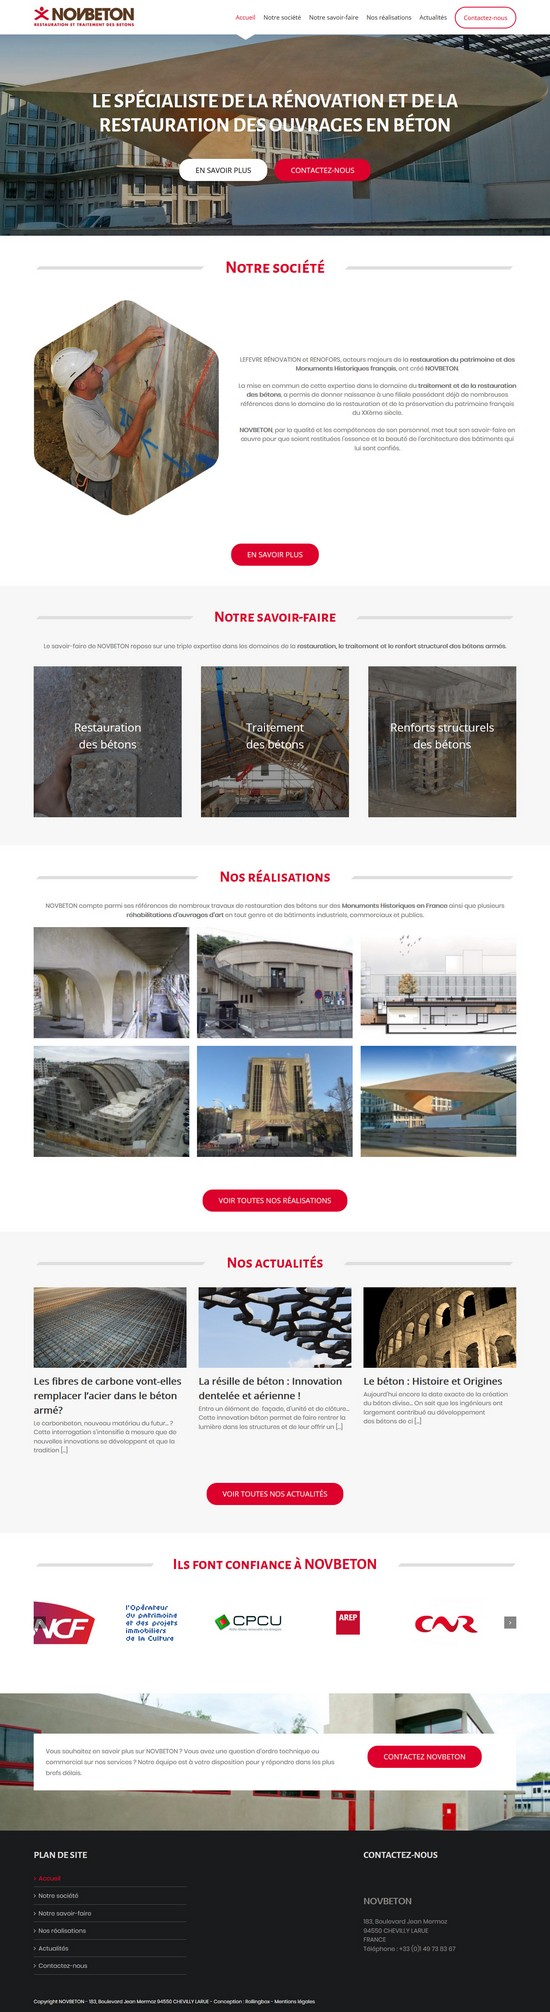 Homepage du site Novbeton